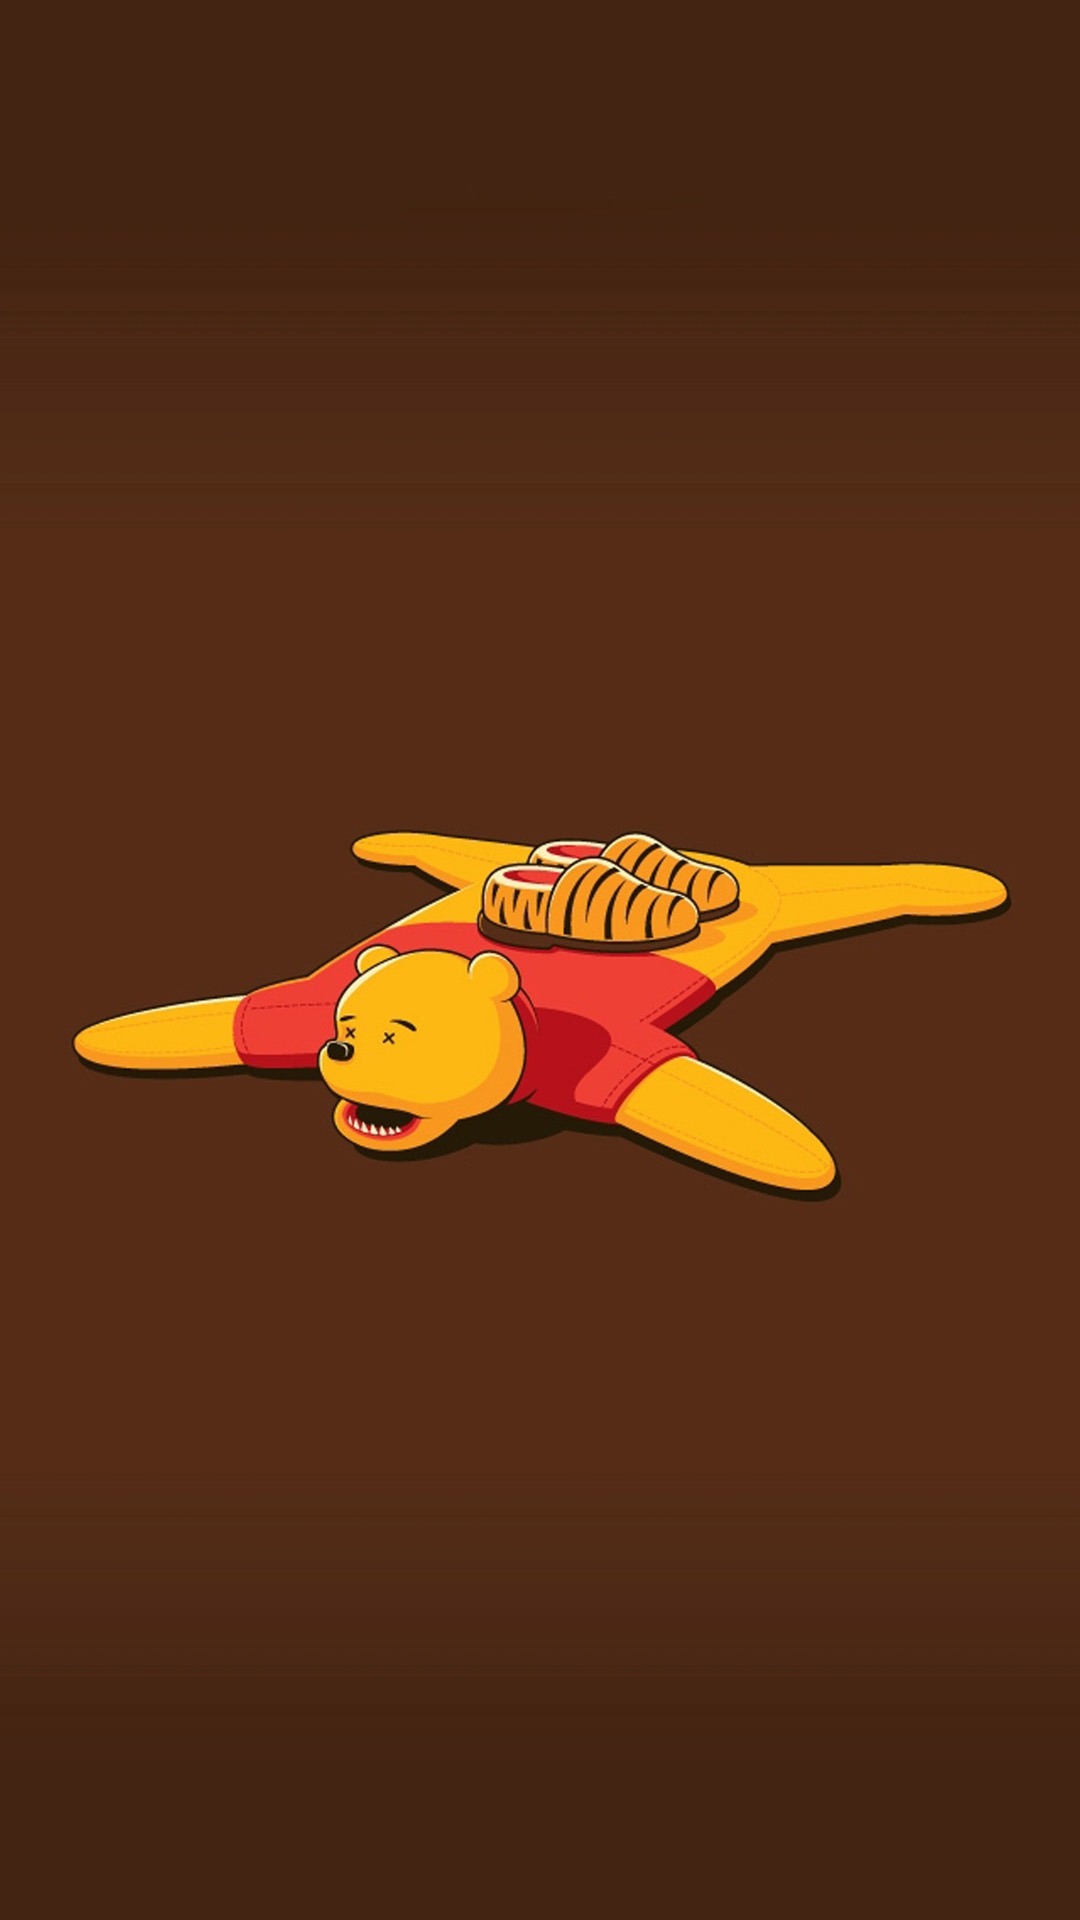 Rorschach Watchmen Wallpaper Hd Funny Winnie The Pooh Hd Wallpaper Iphone 6 Plus